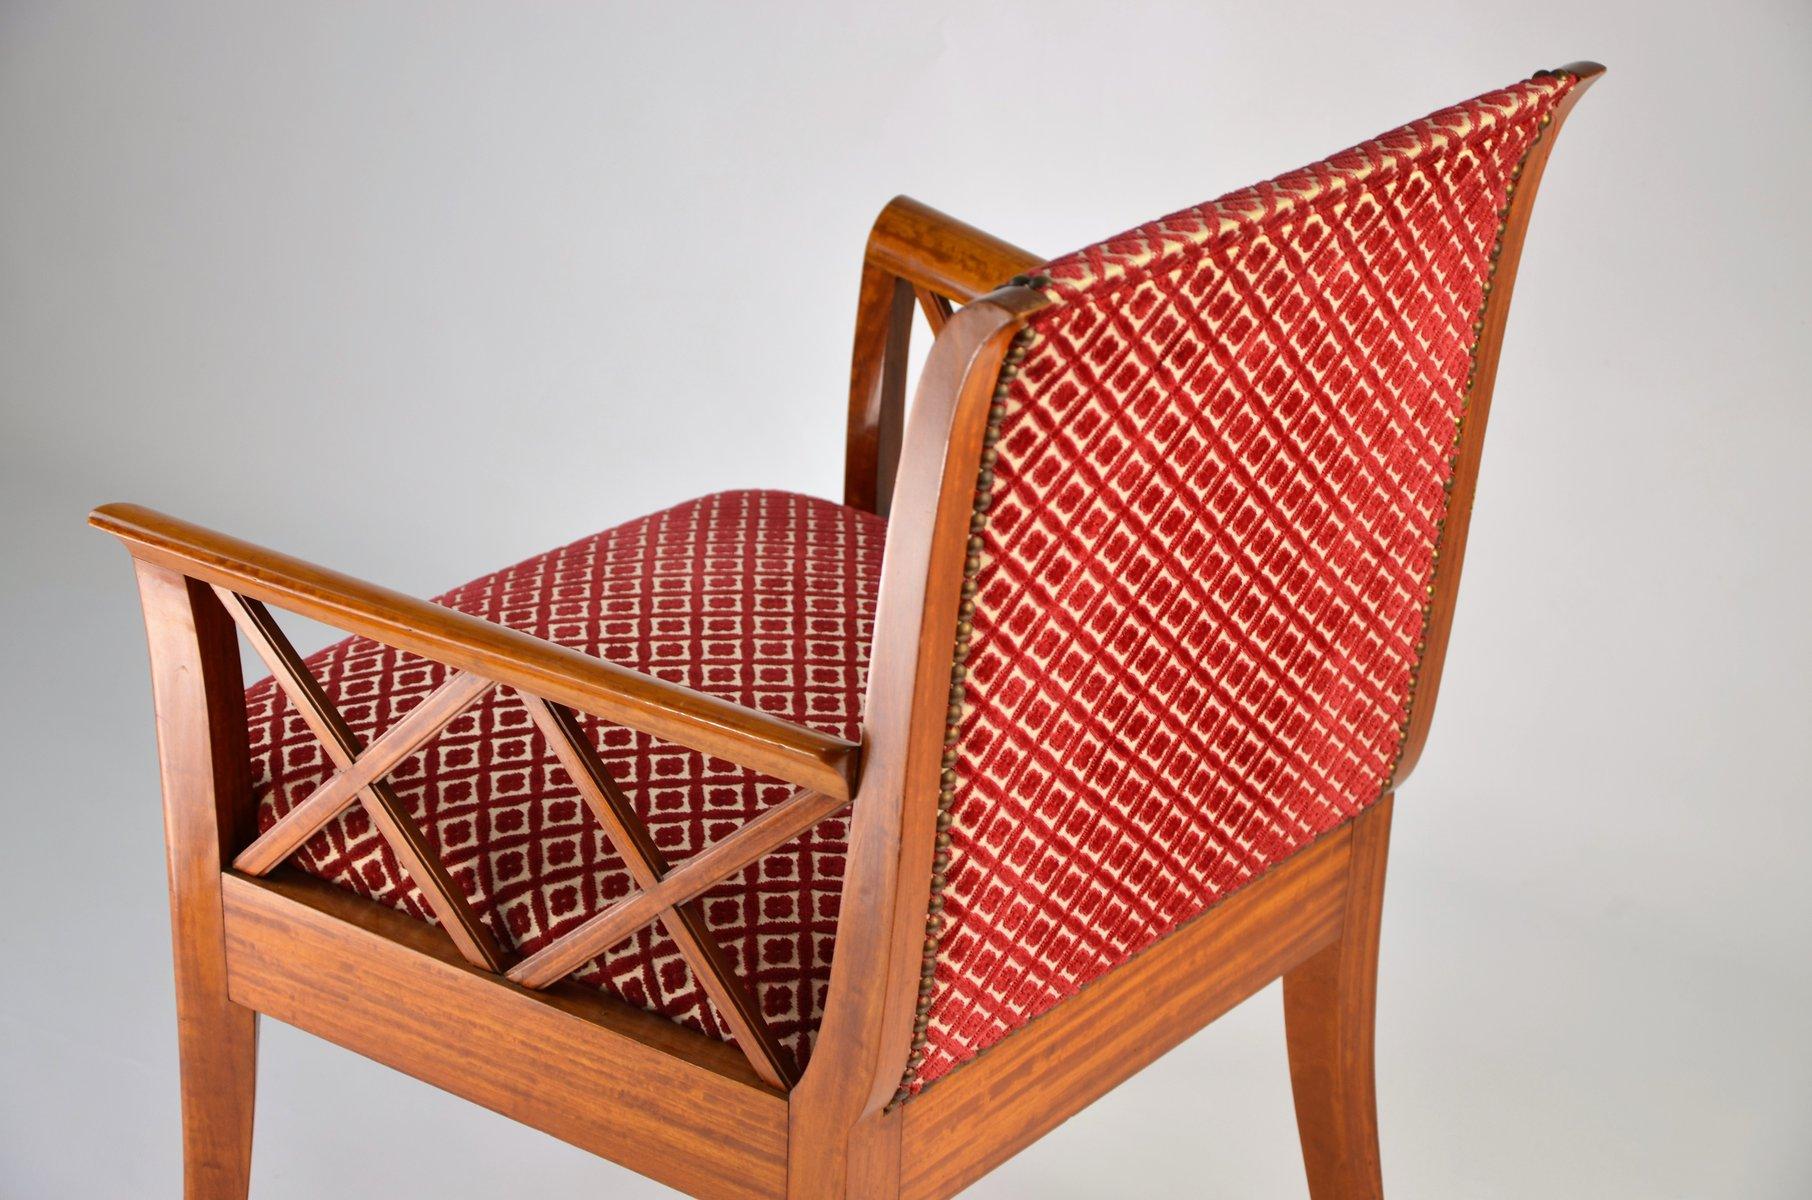 armlehnstuhl aus kirschholz 1940er bei pamono kaufen. Black Bedroom Furniture Sets. Home Design Ideas